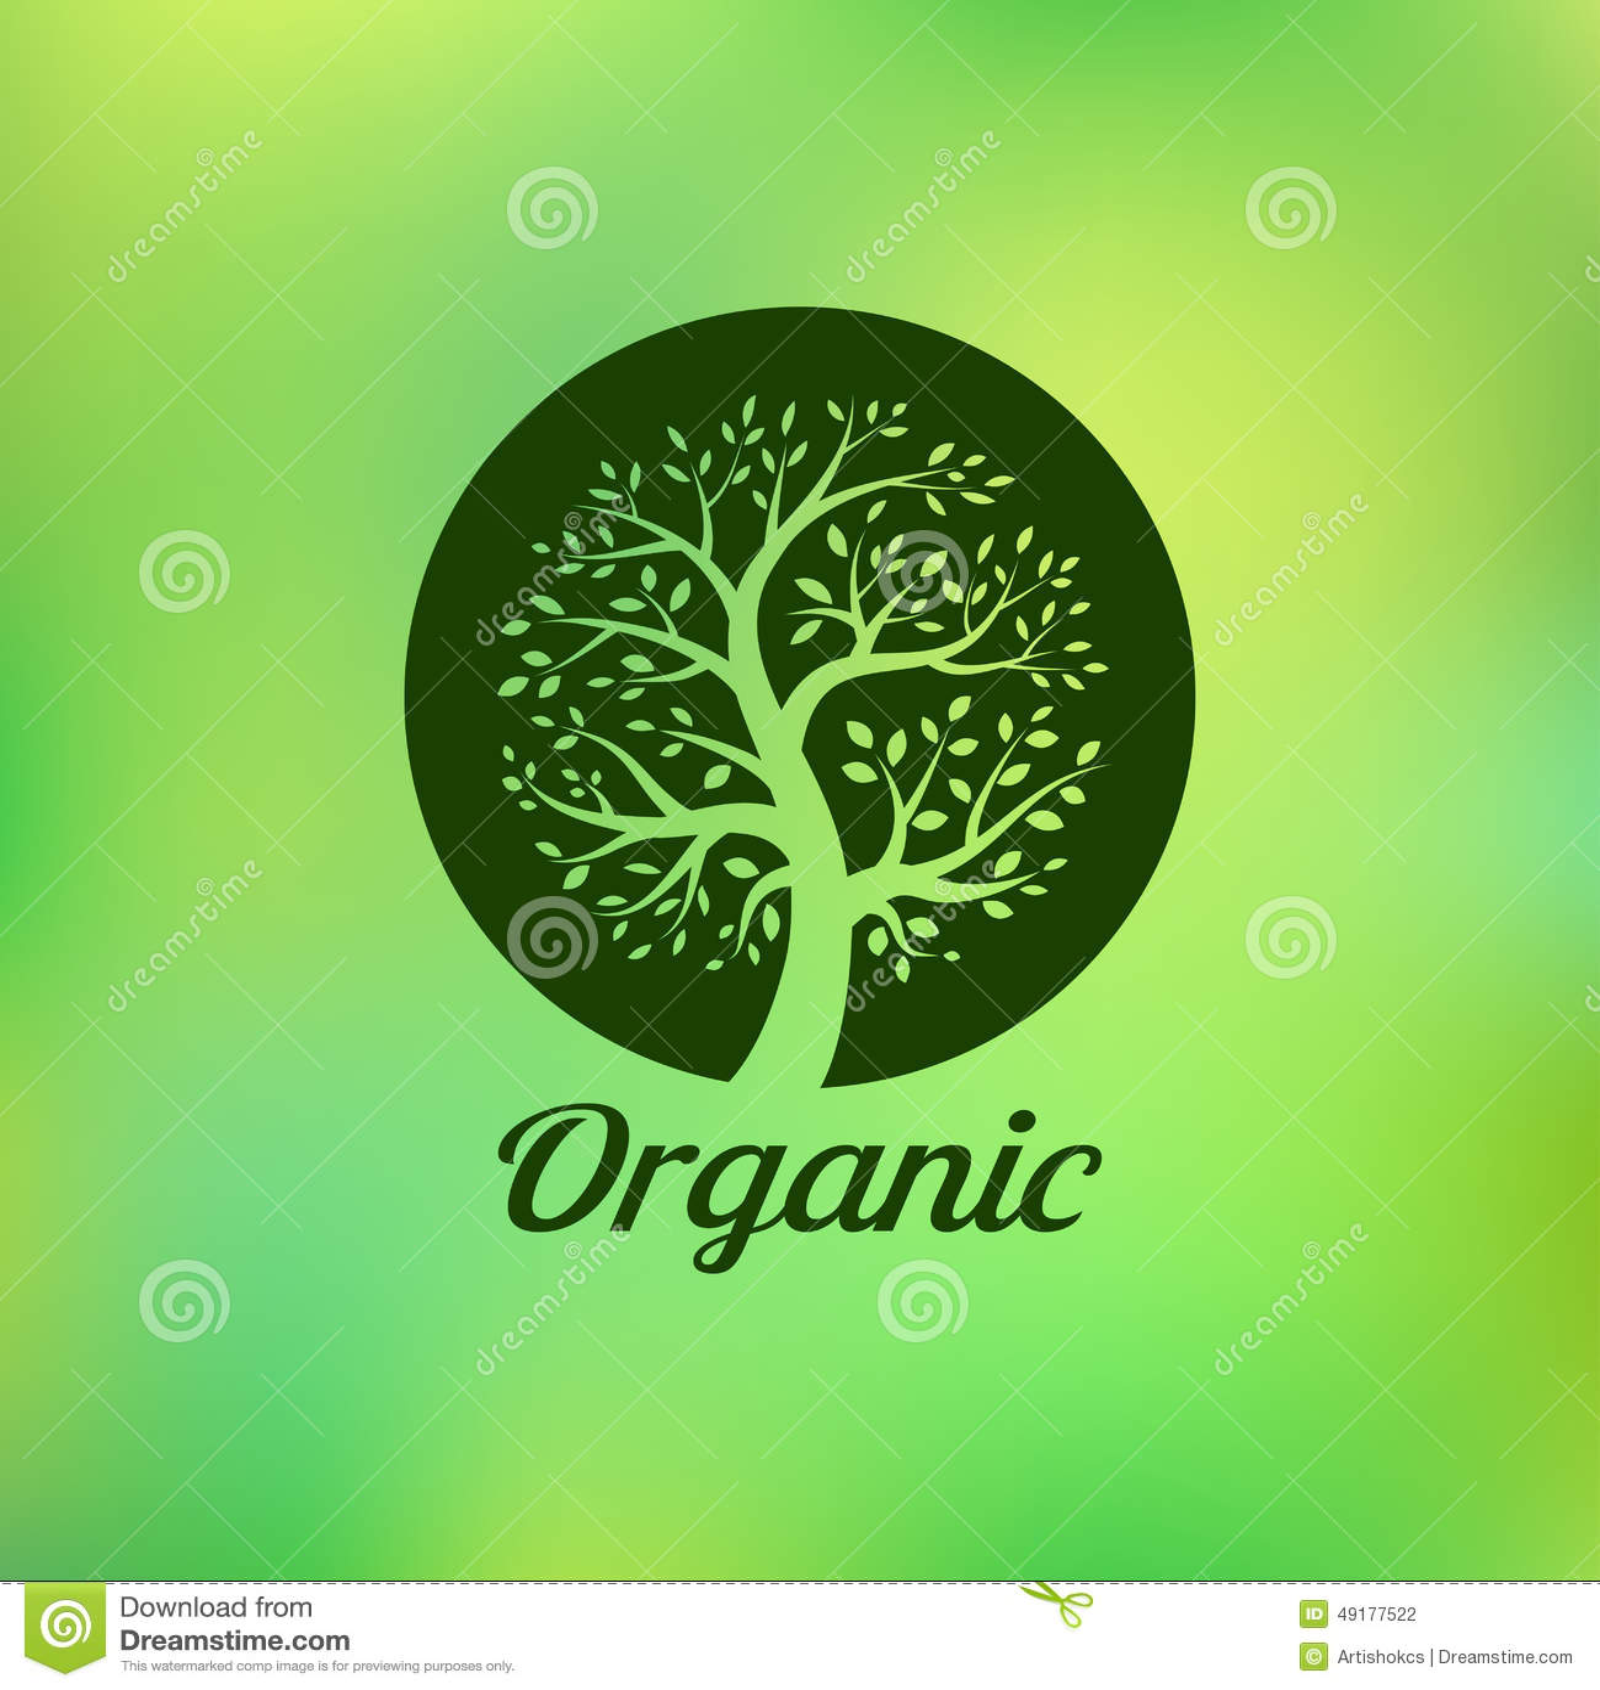 By Nature Organics